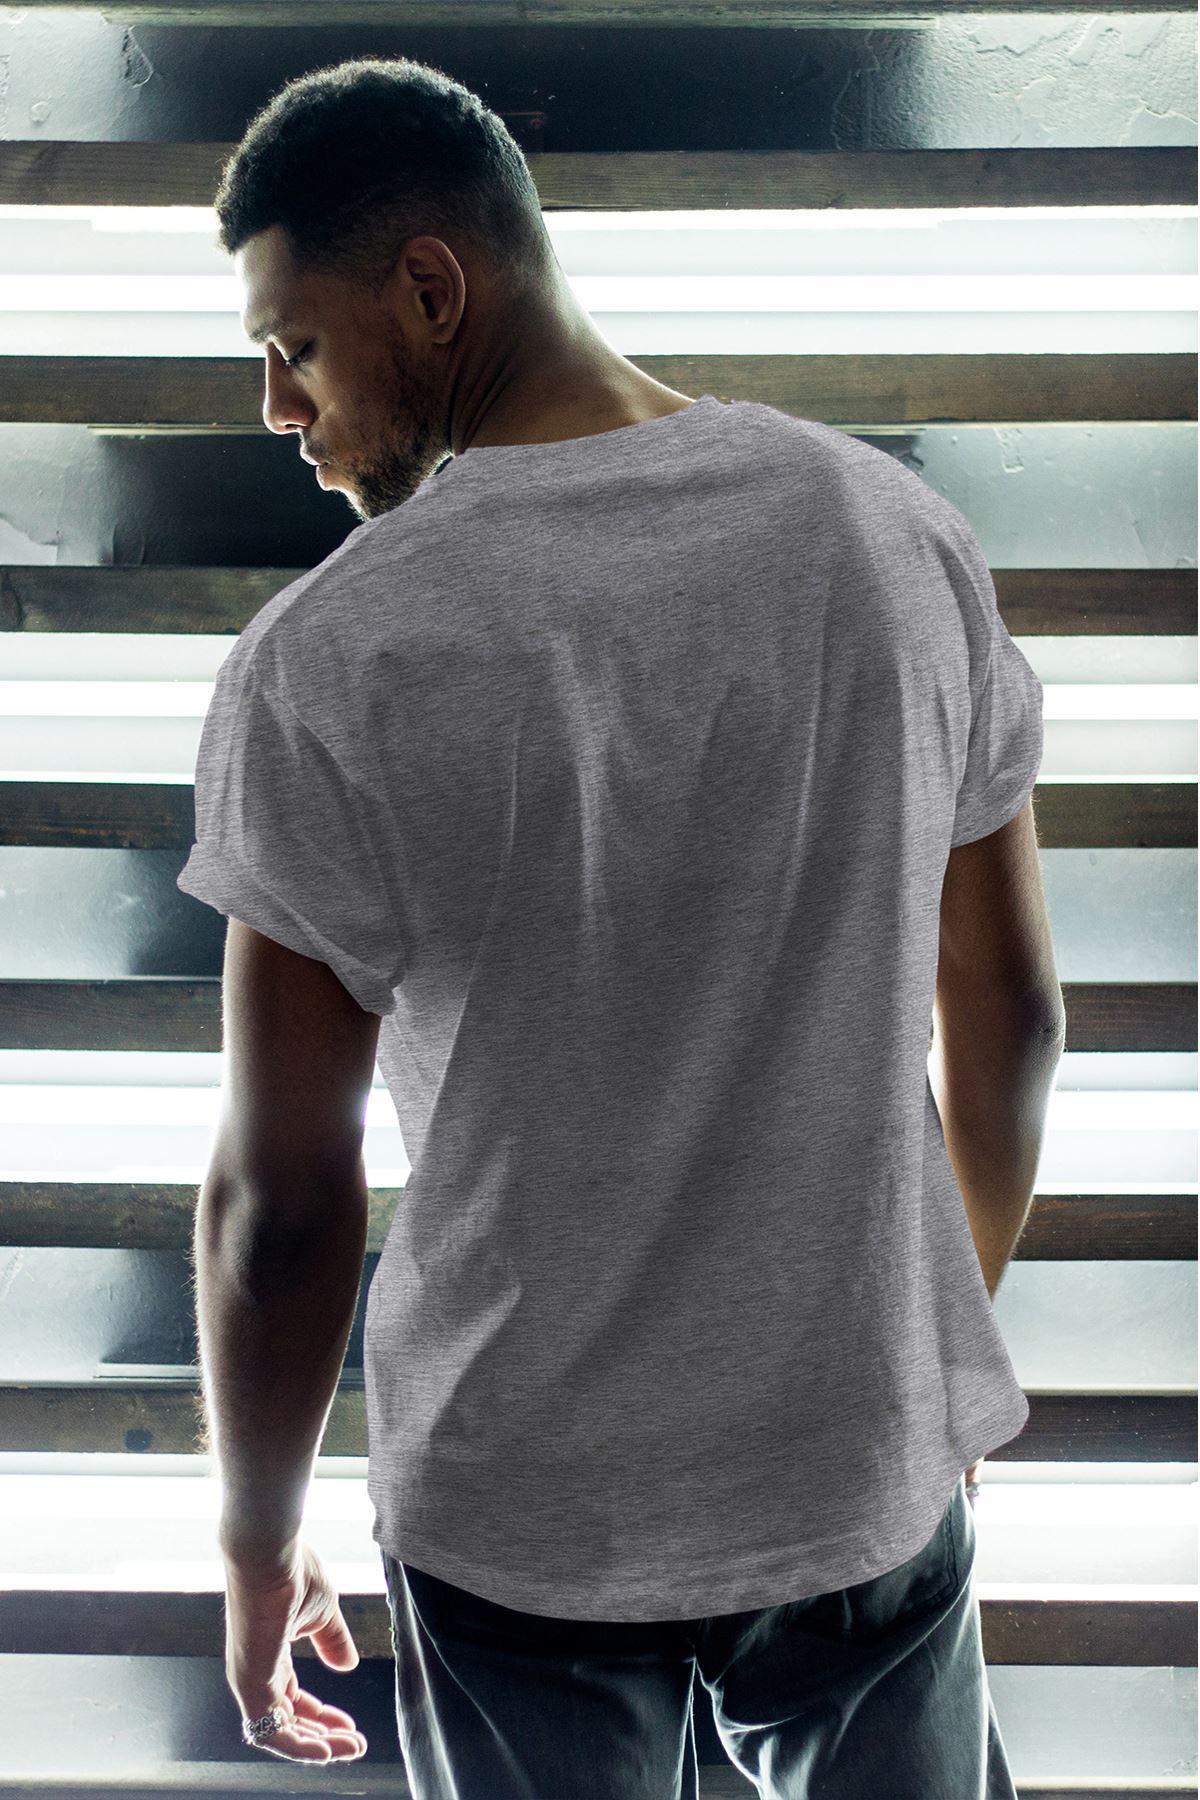 Attack on Titan Gri Erkek Oversize Tshirt - Tişört